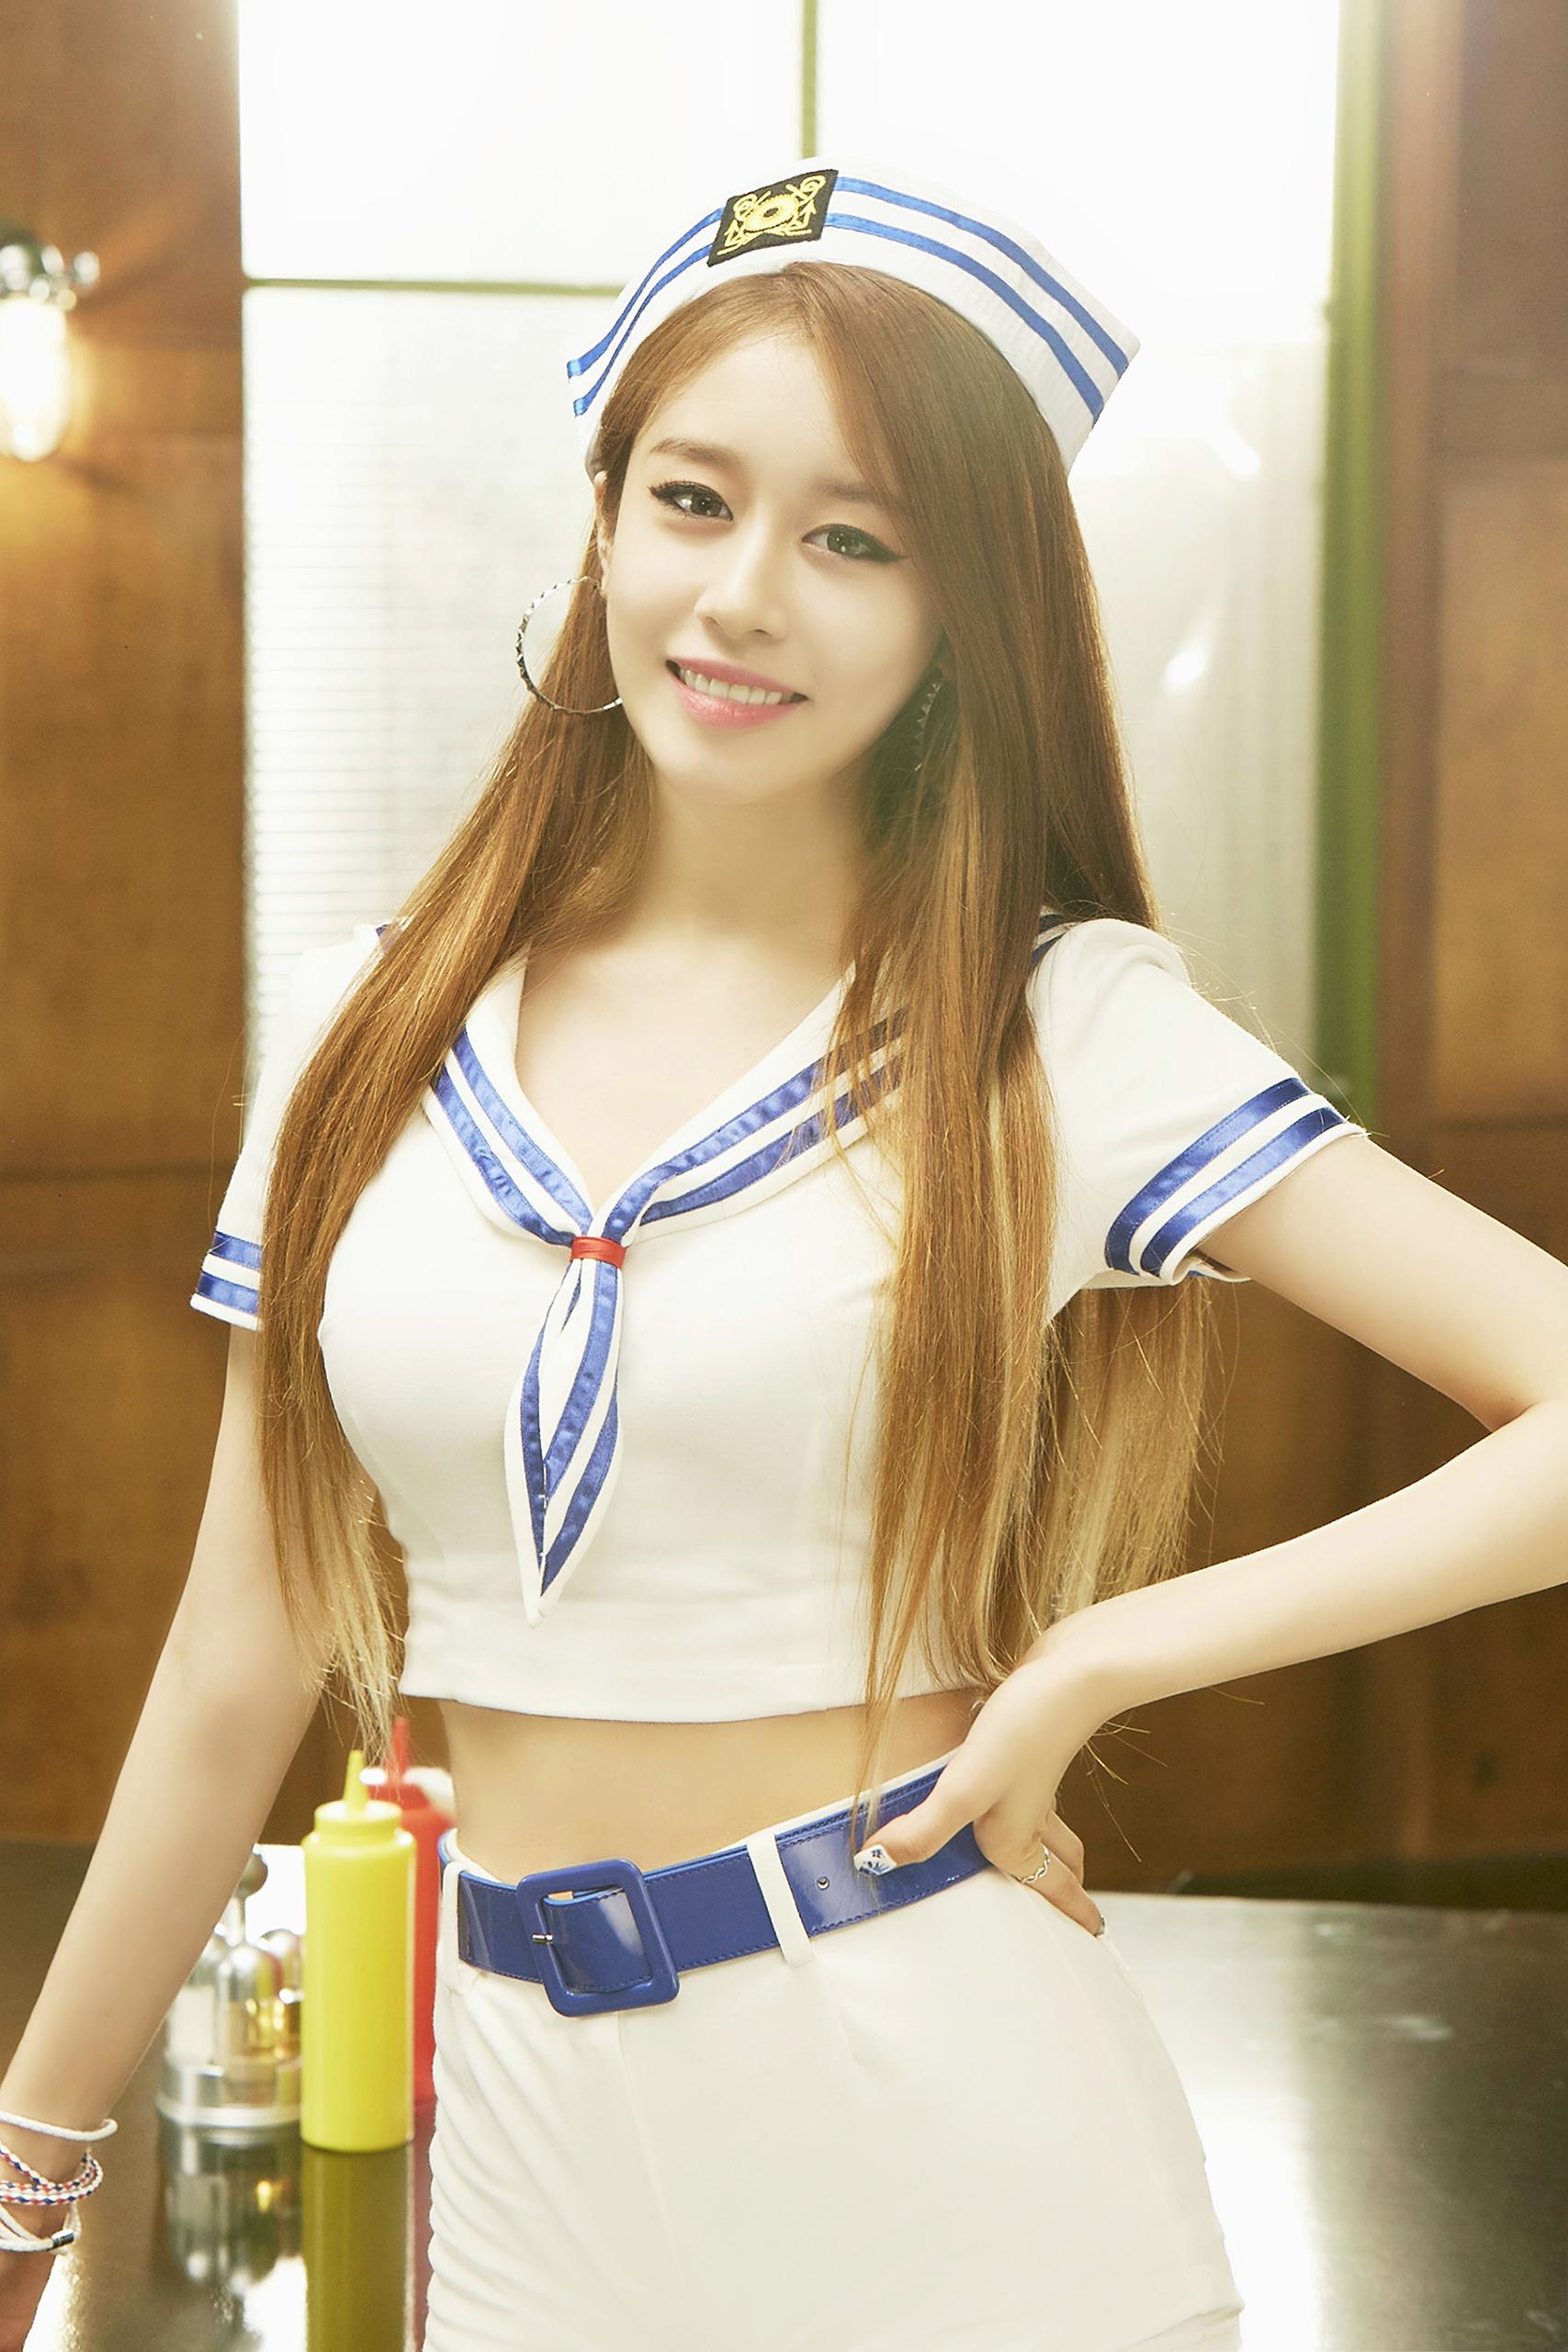 Ff park jiyeon dating